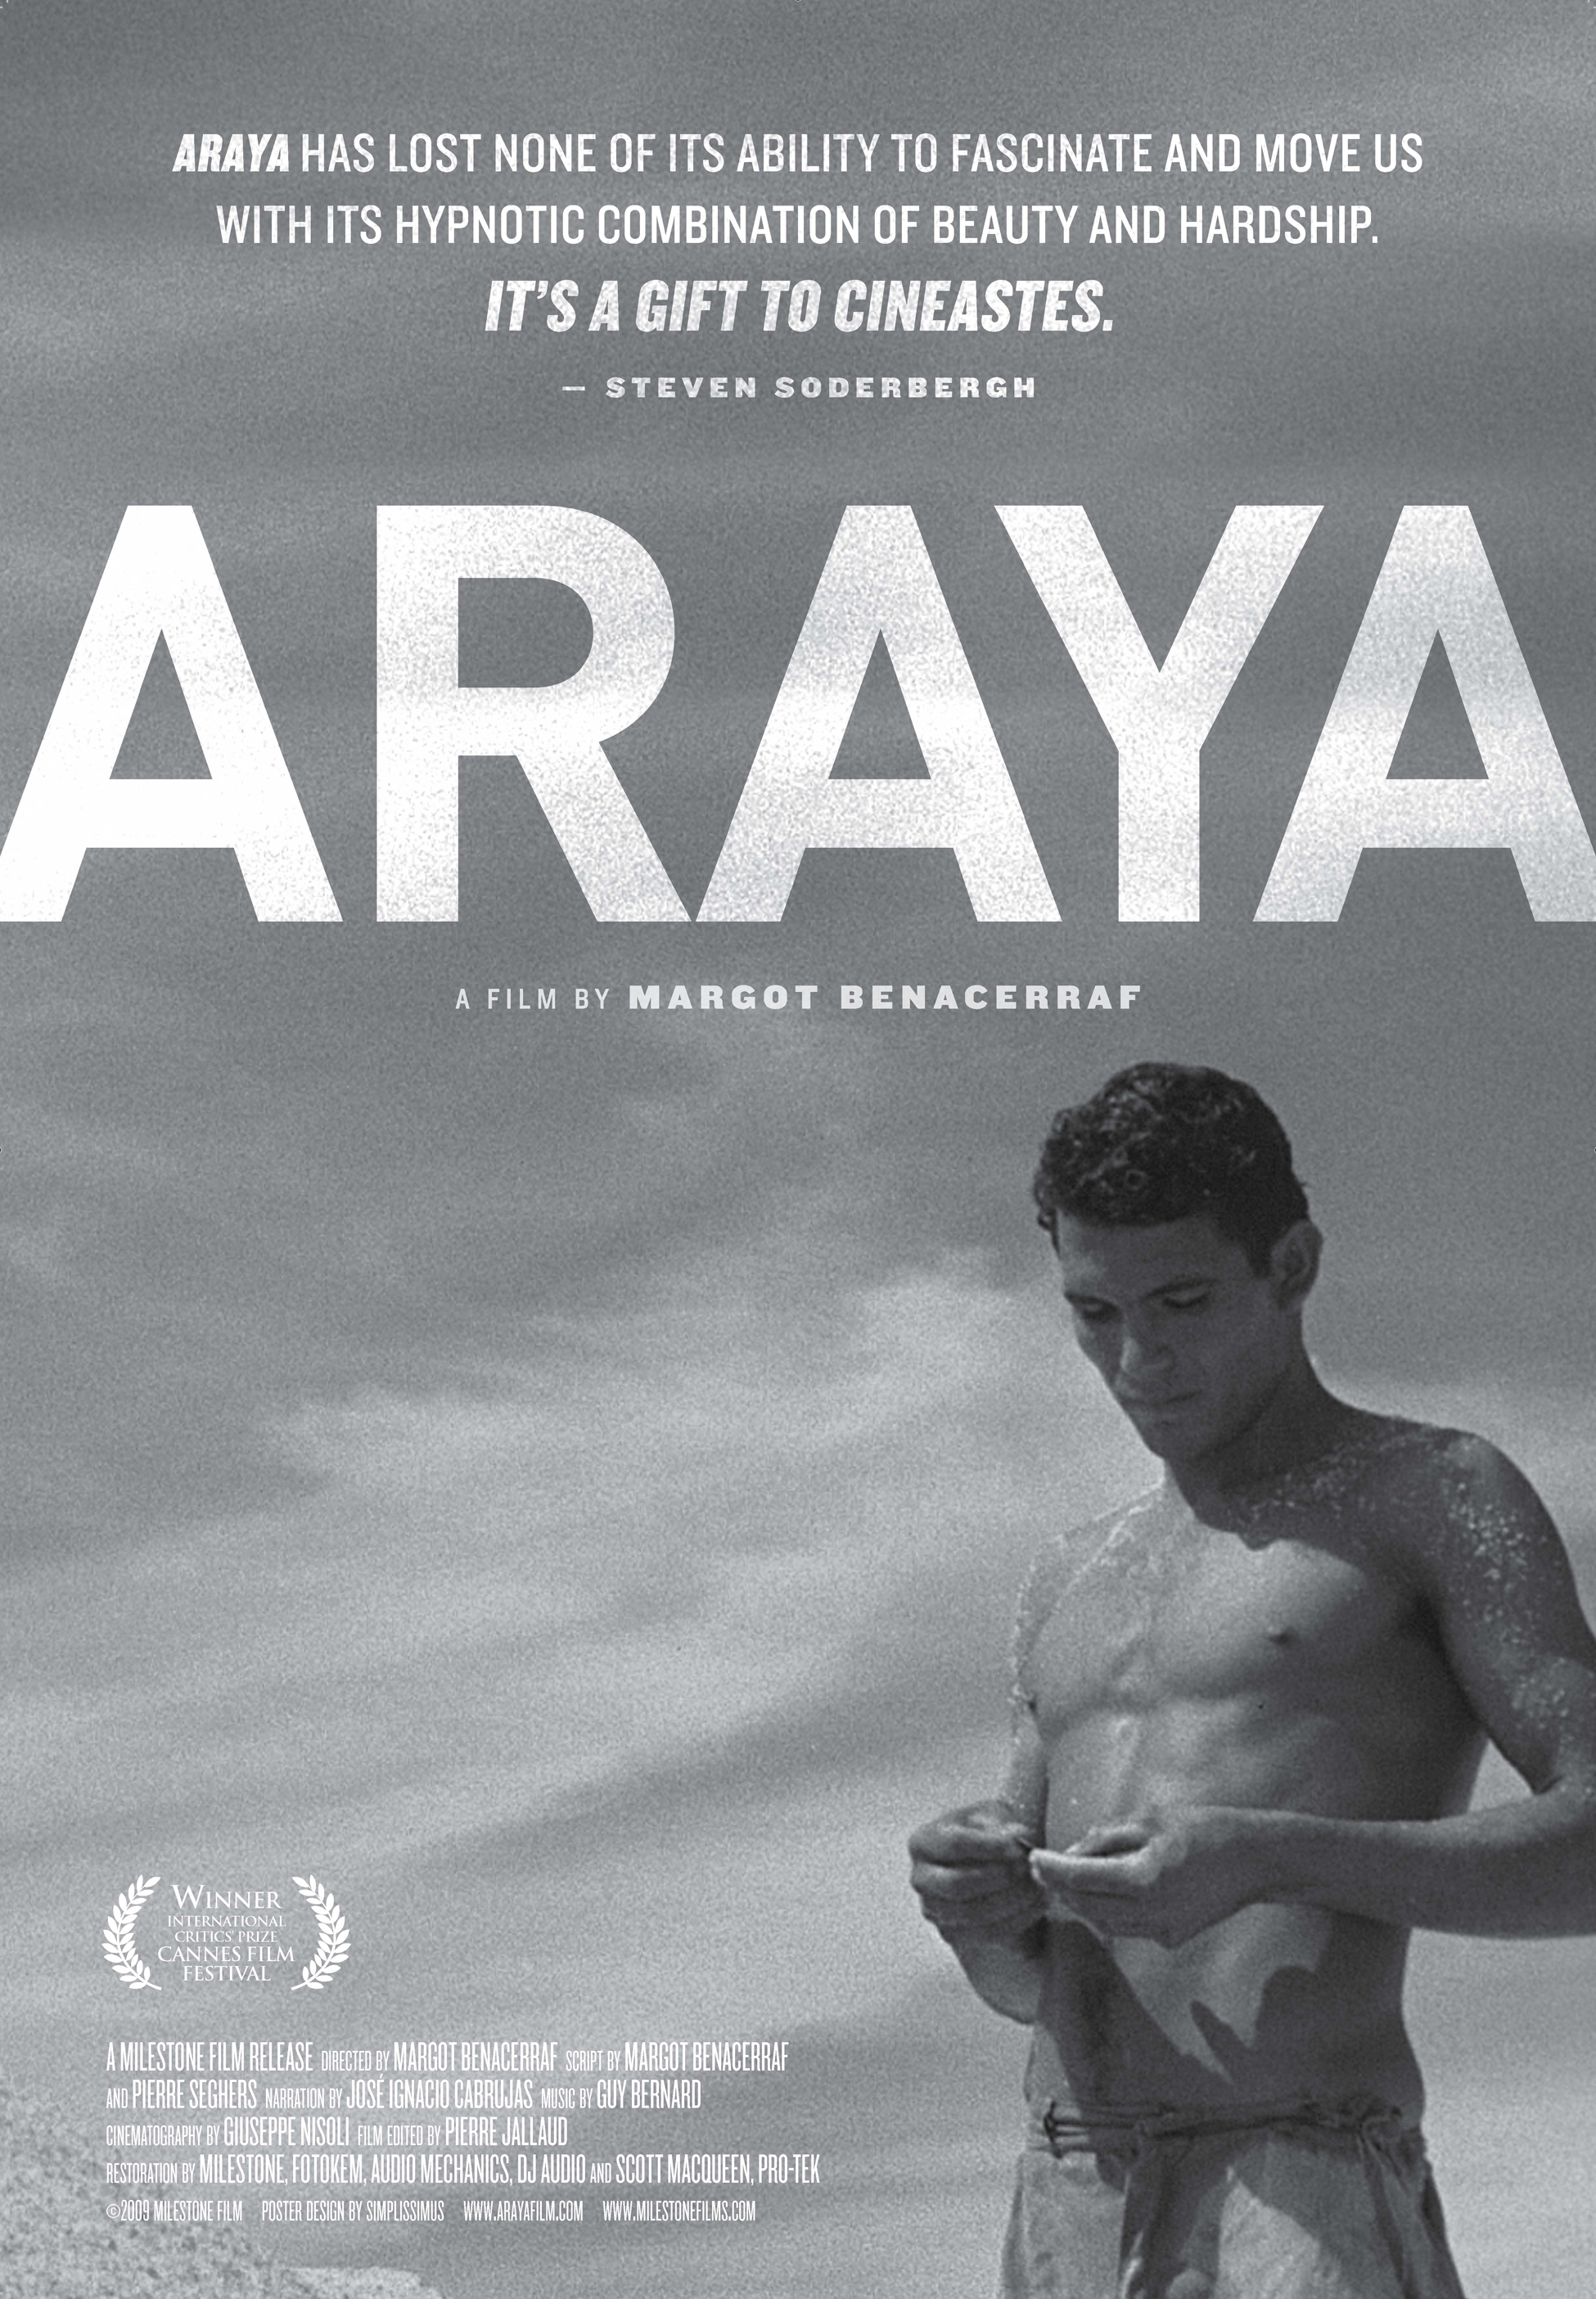 http://www.arayafilm.com/images/ArayaFavoritePosterImageSmall.jpg